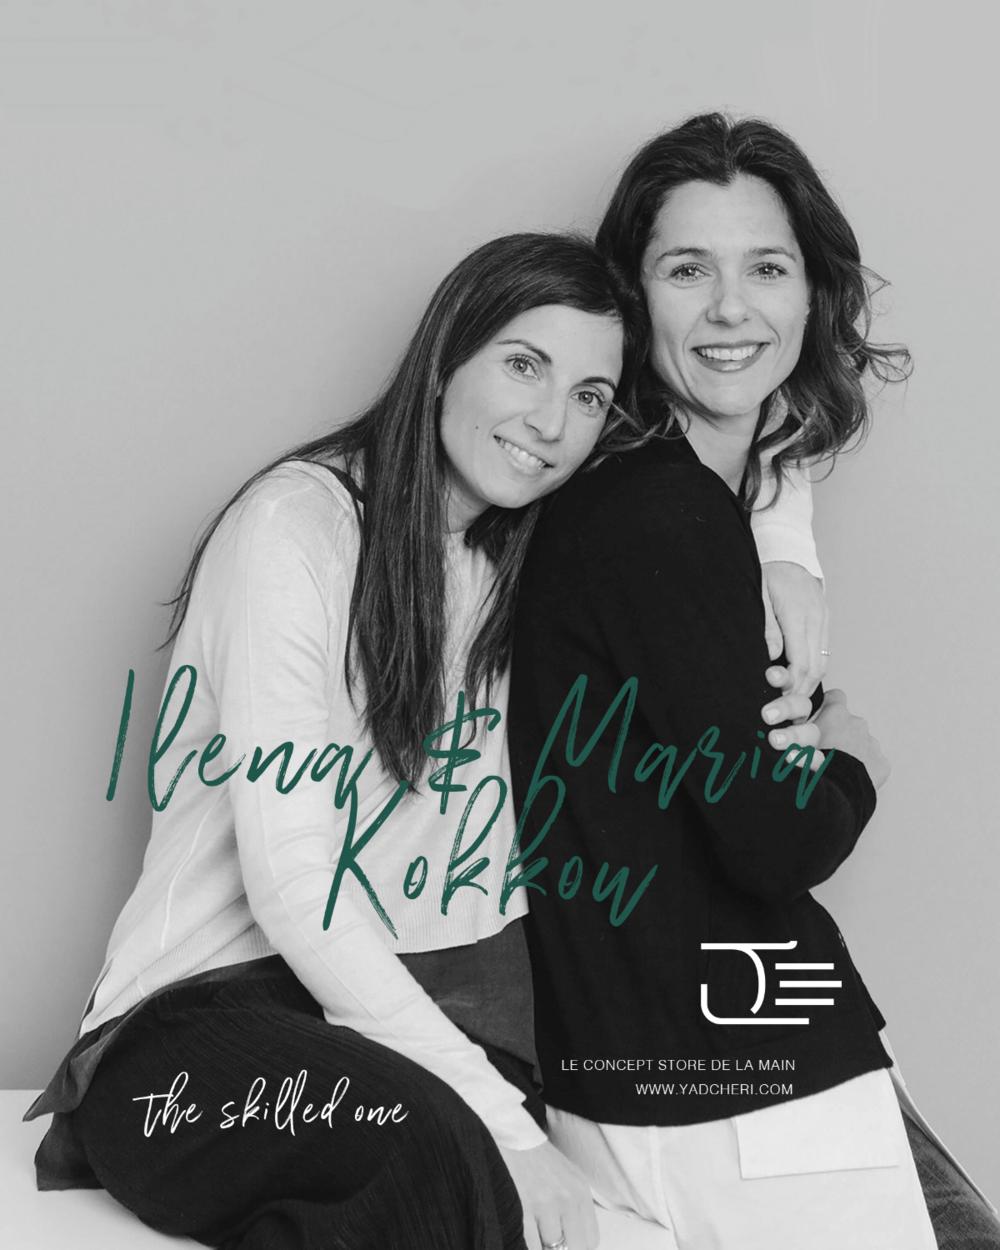 Ilena&MariaKokkou-2-2.png